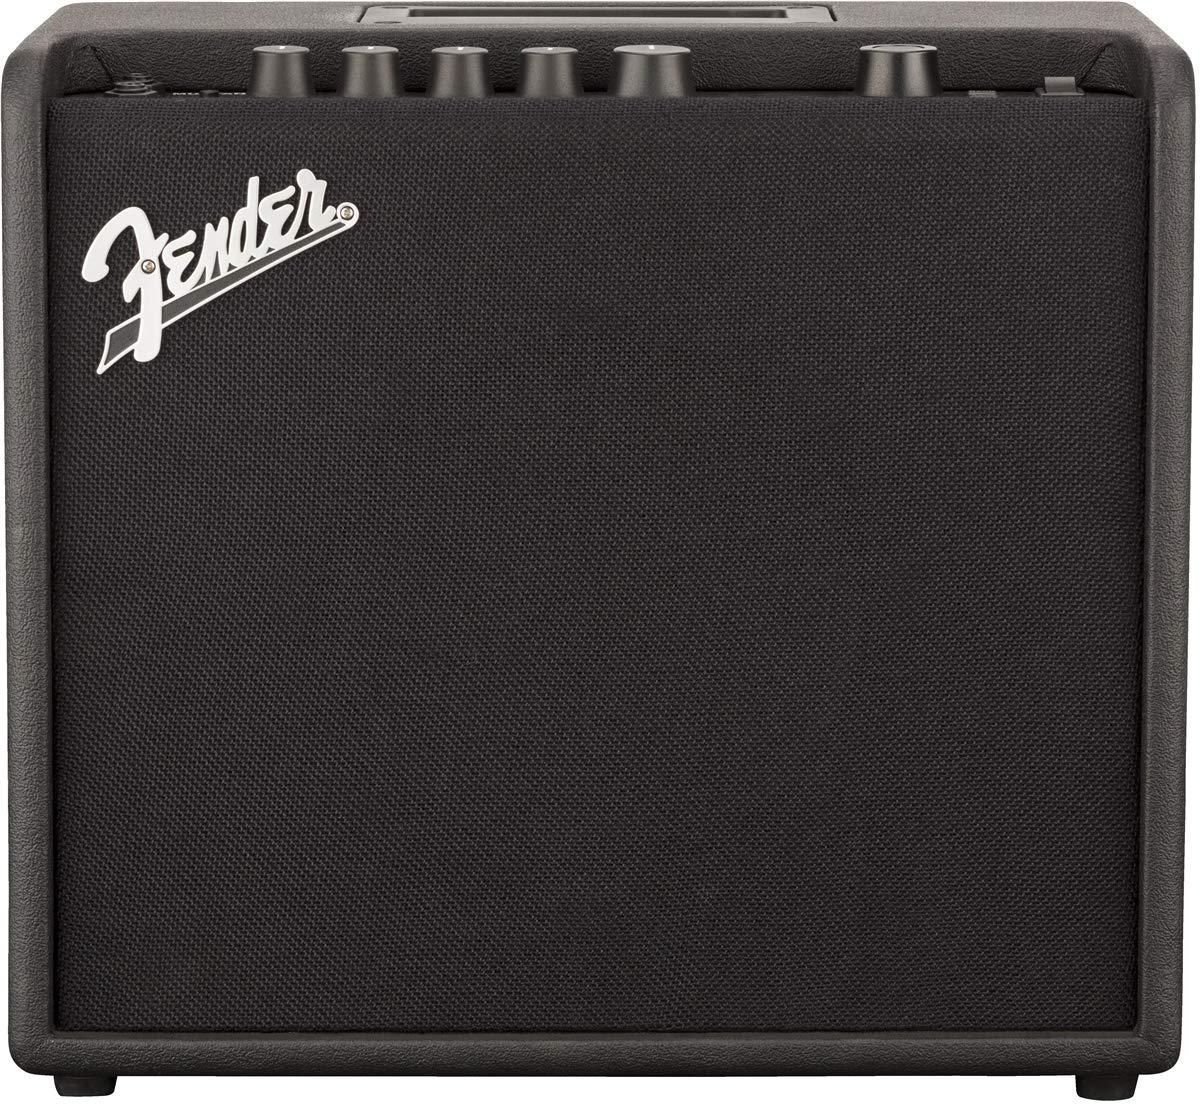 Fender Mustang LT-25 - Digital Guitar Amplifier by Fender